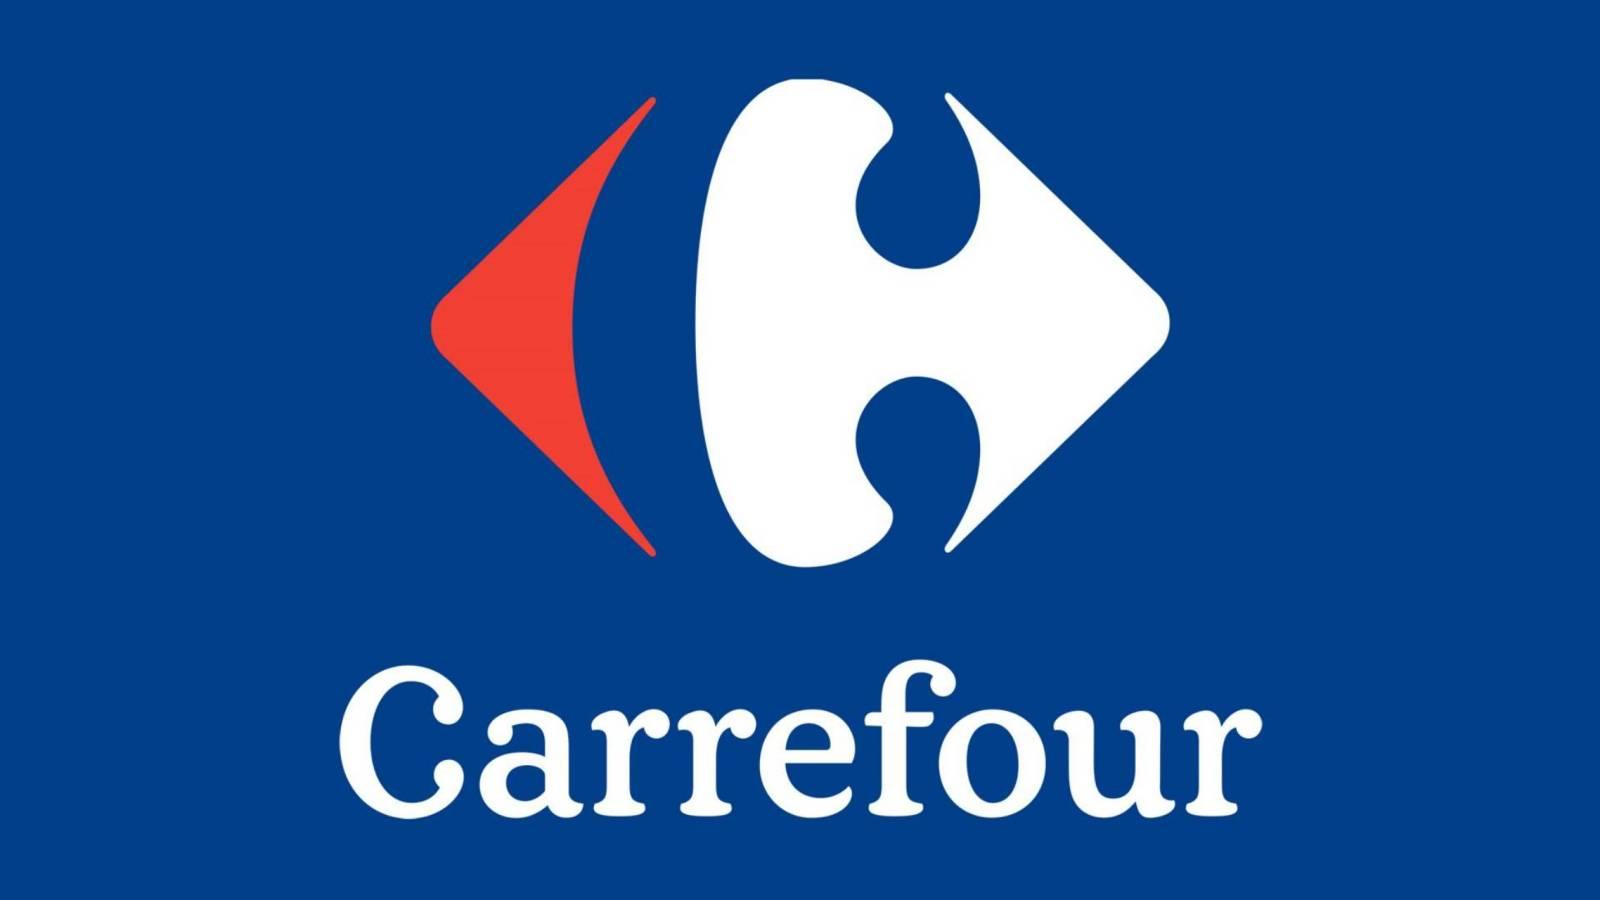 Carrefour livrarile